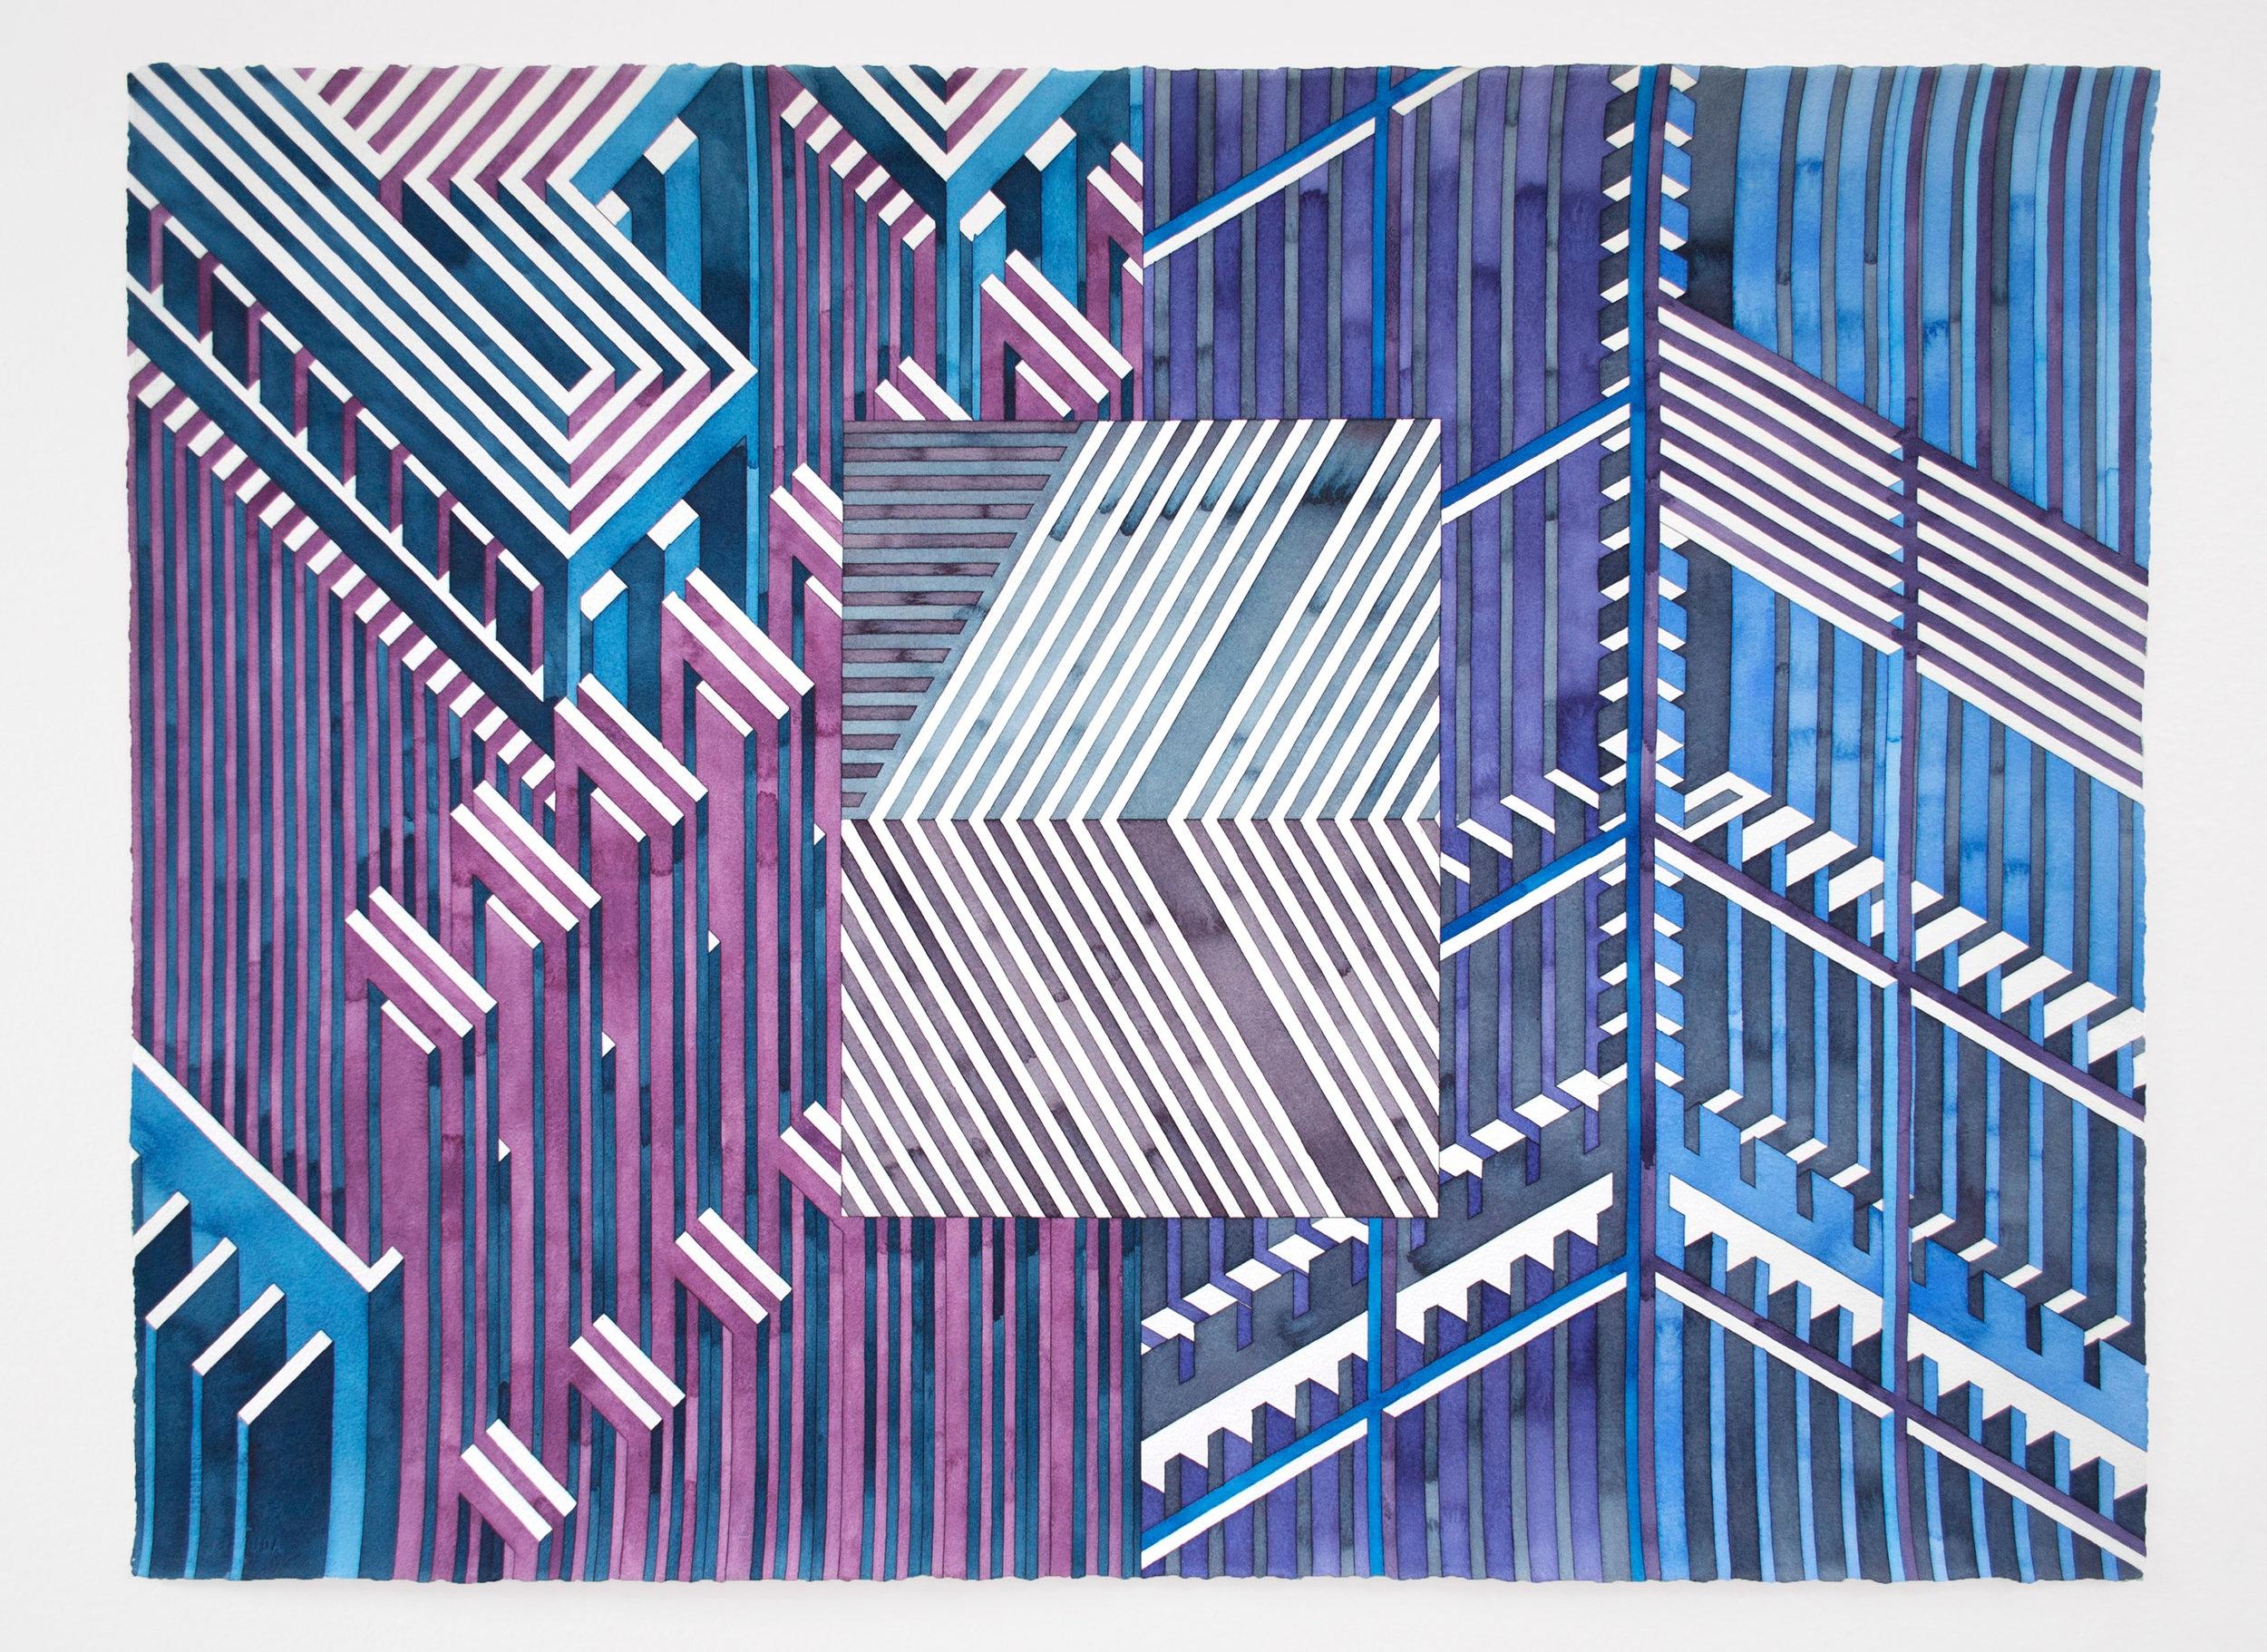 Facility 9, 2019 | watercolor graphite on watercolor paper | 22 x 30 inches